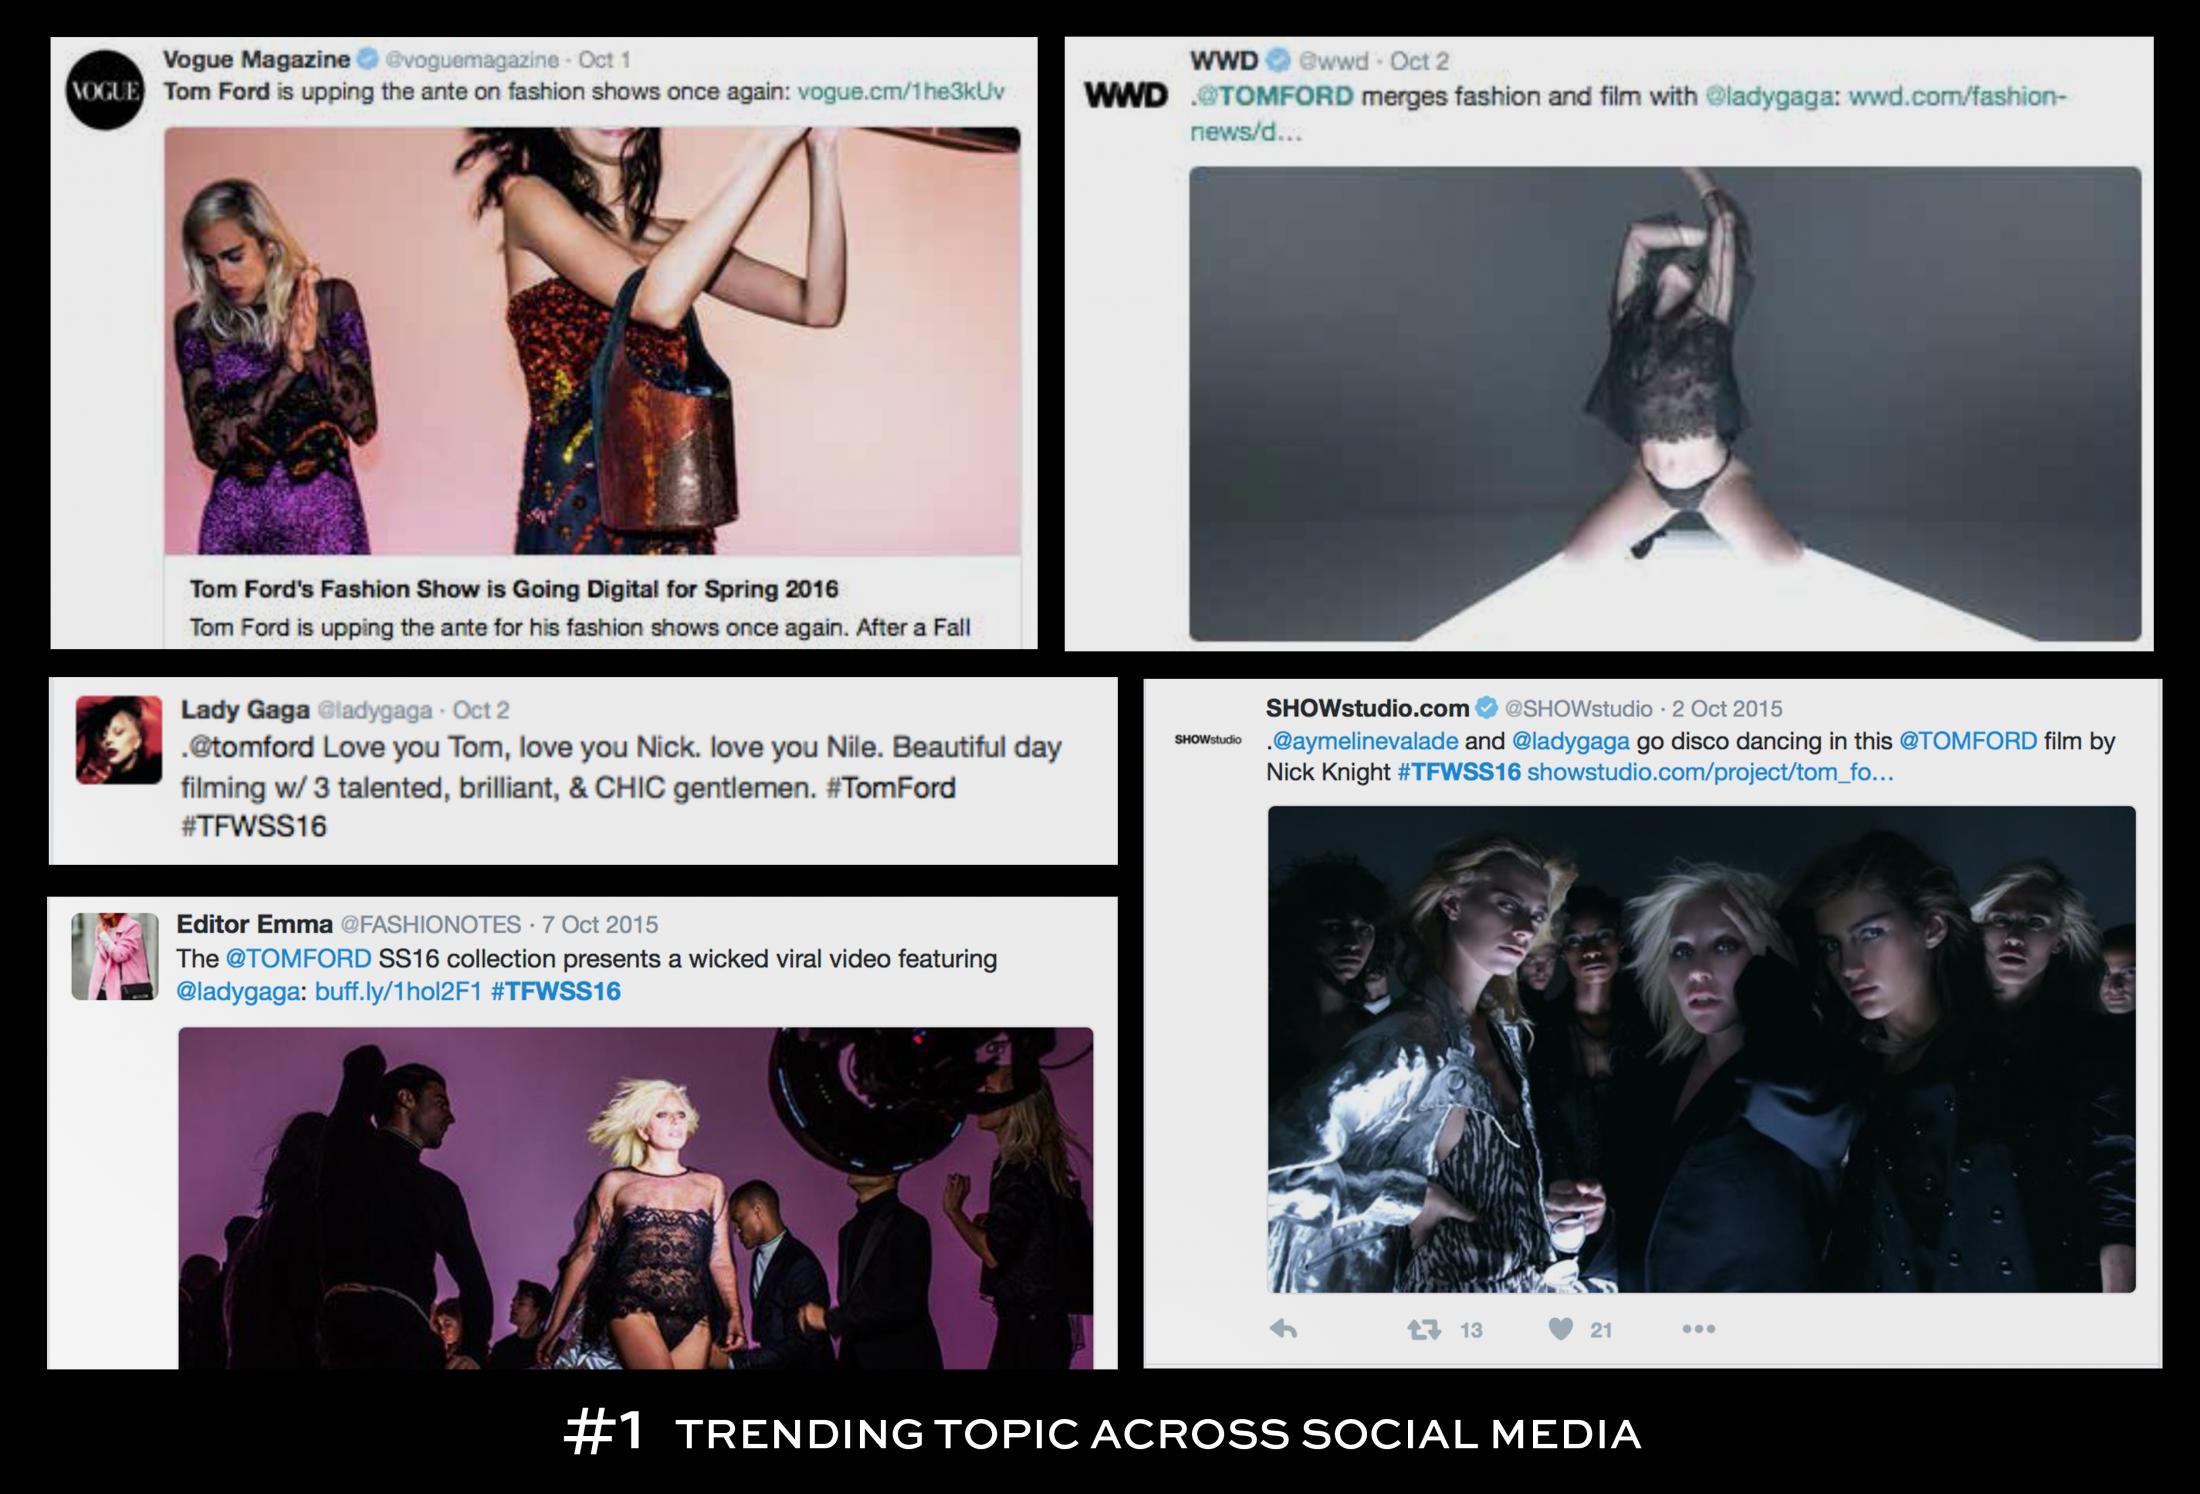 Thumbnail for Digital Fashion Presentation